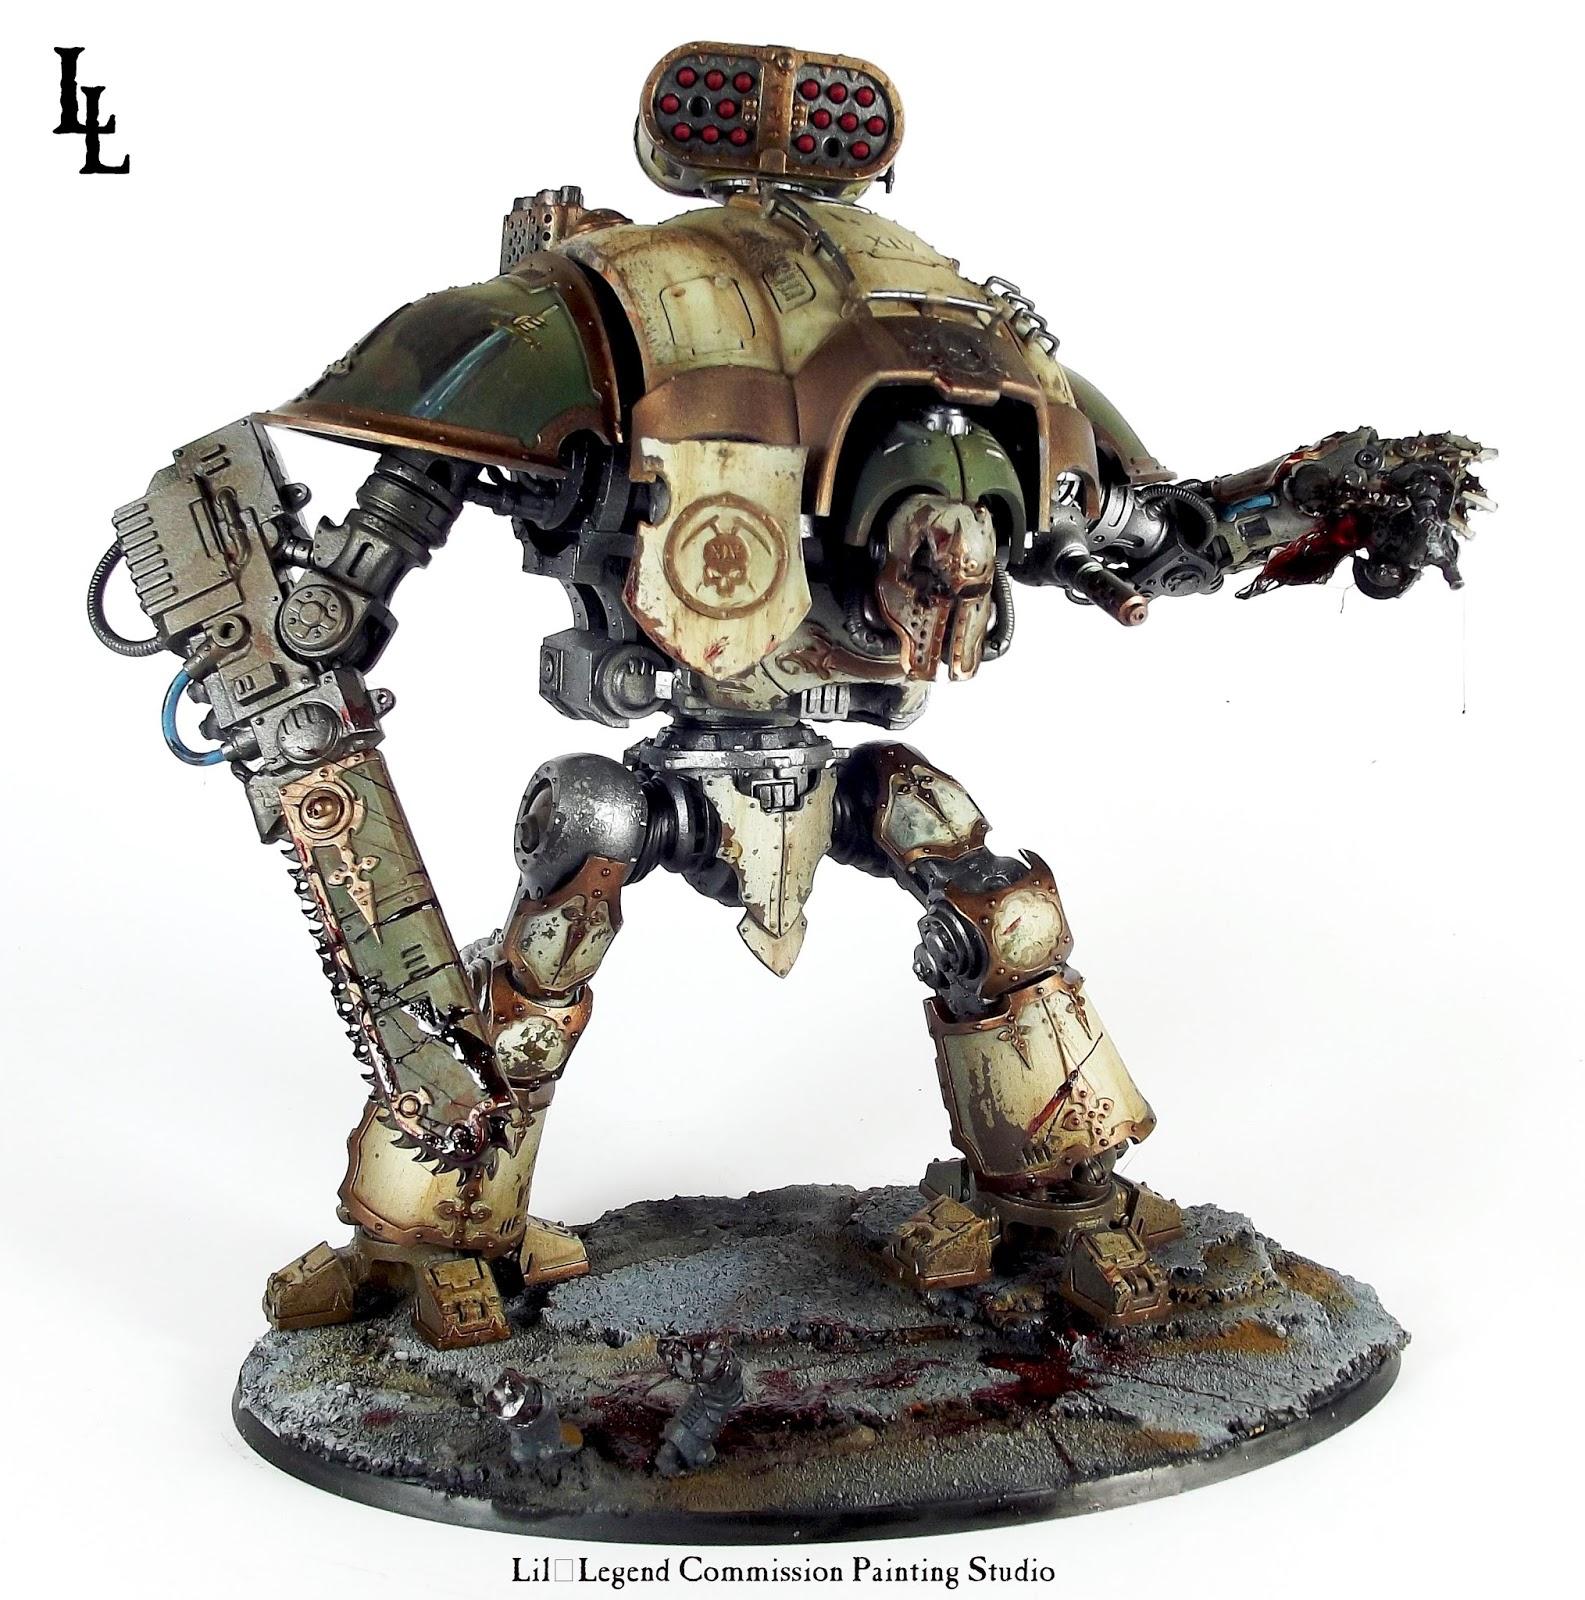 Fallen Angel - Deathguard Knight Titan Gallant - Spikey Bits